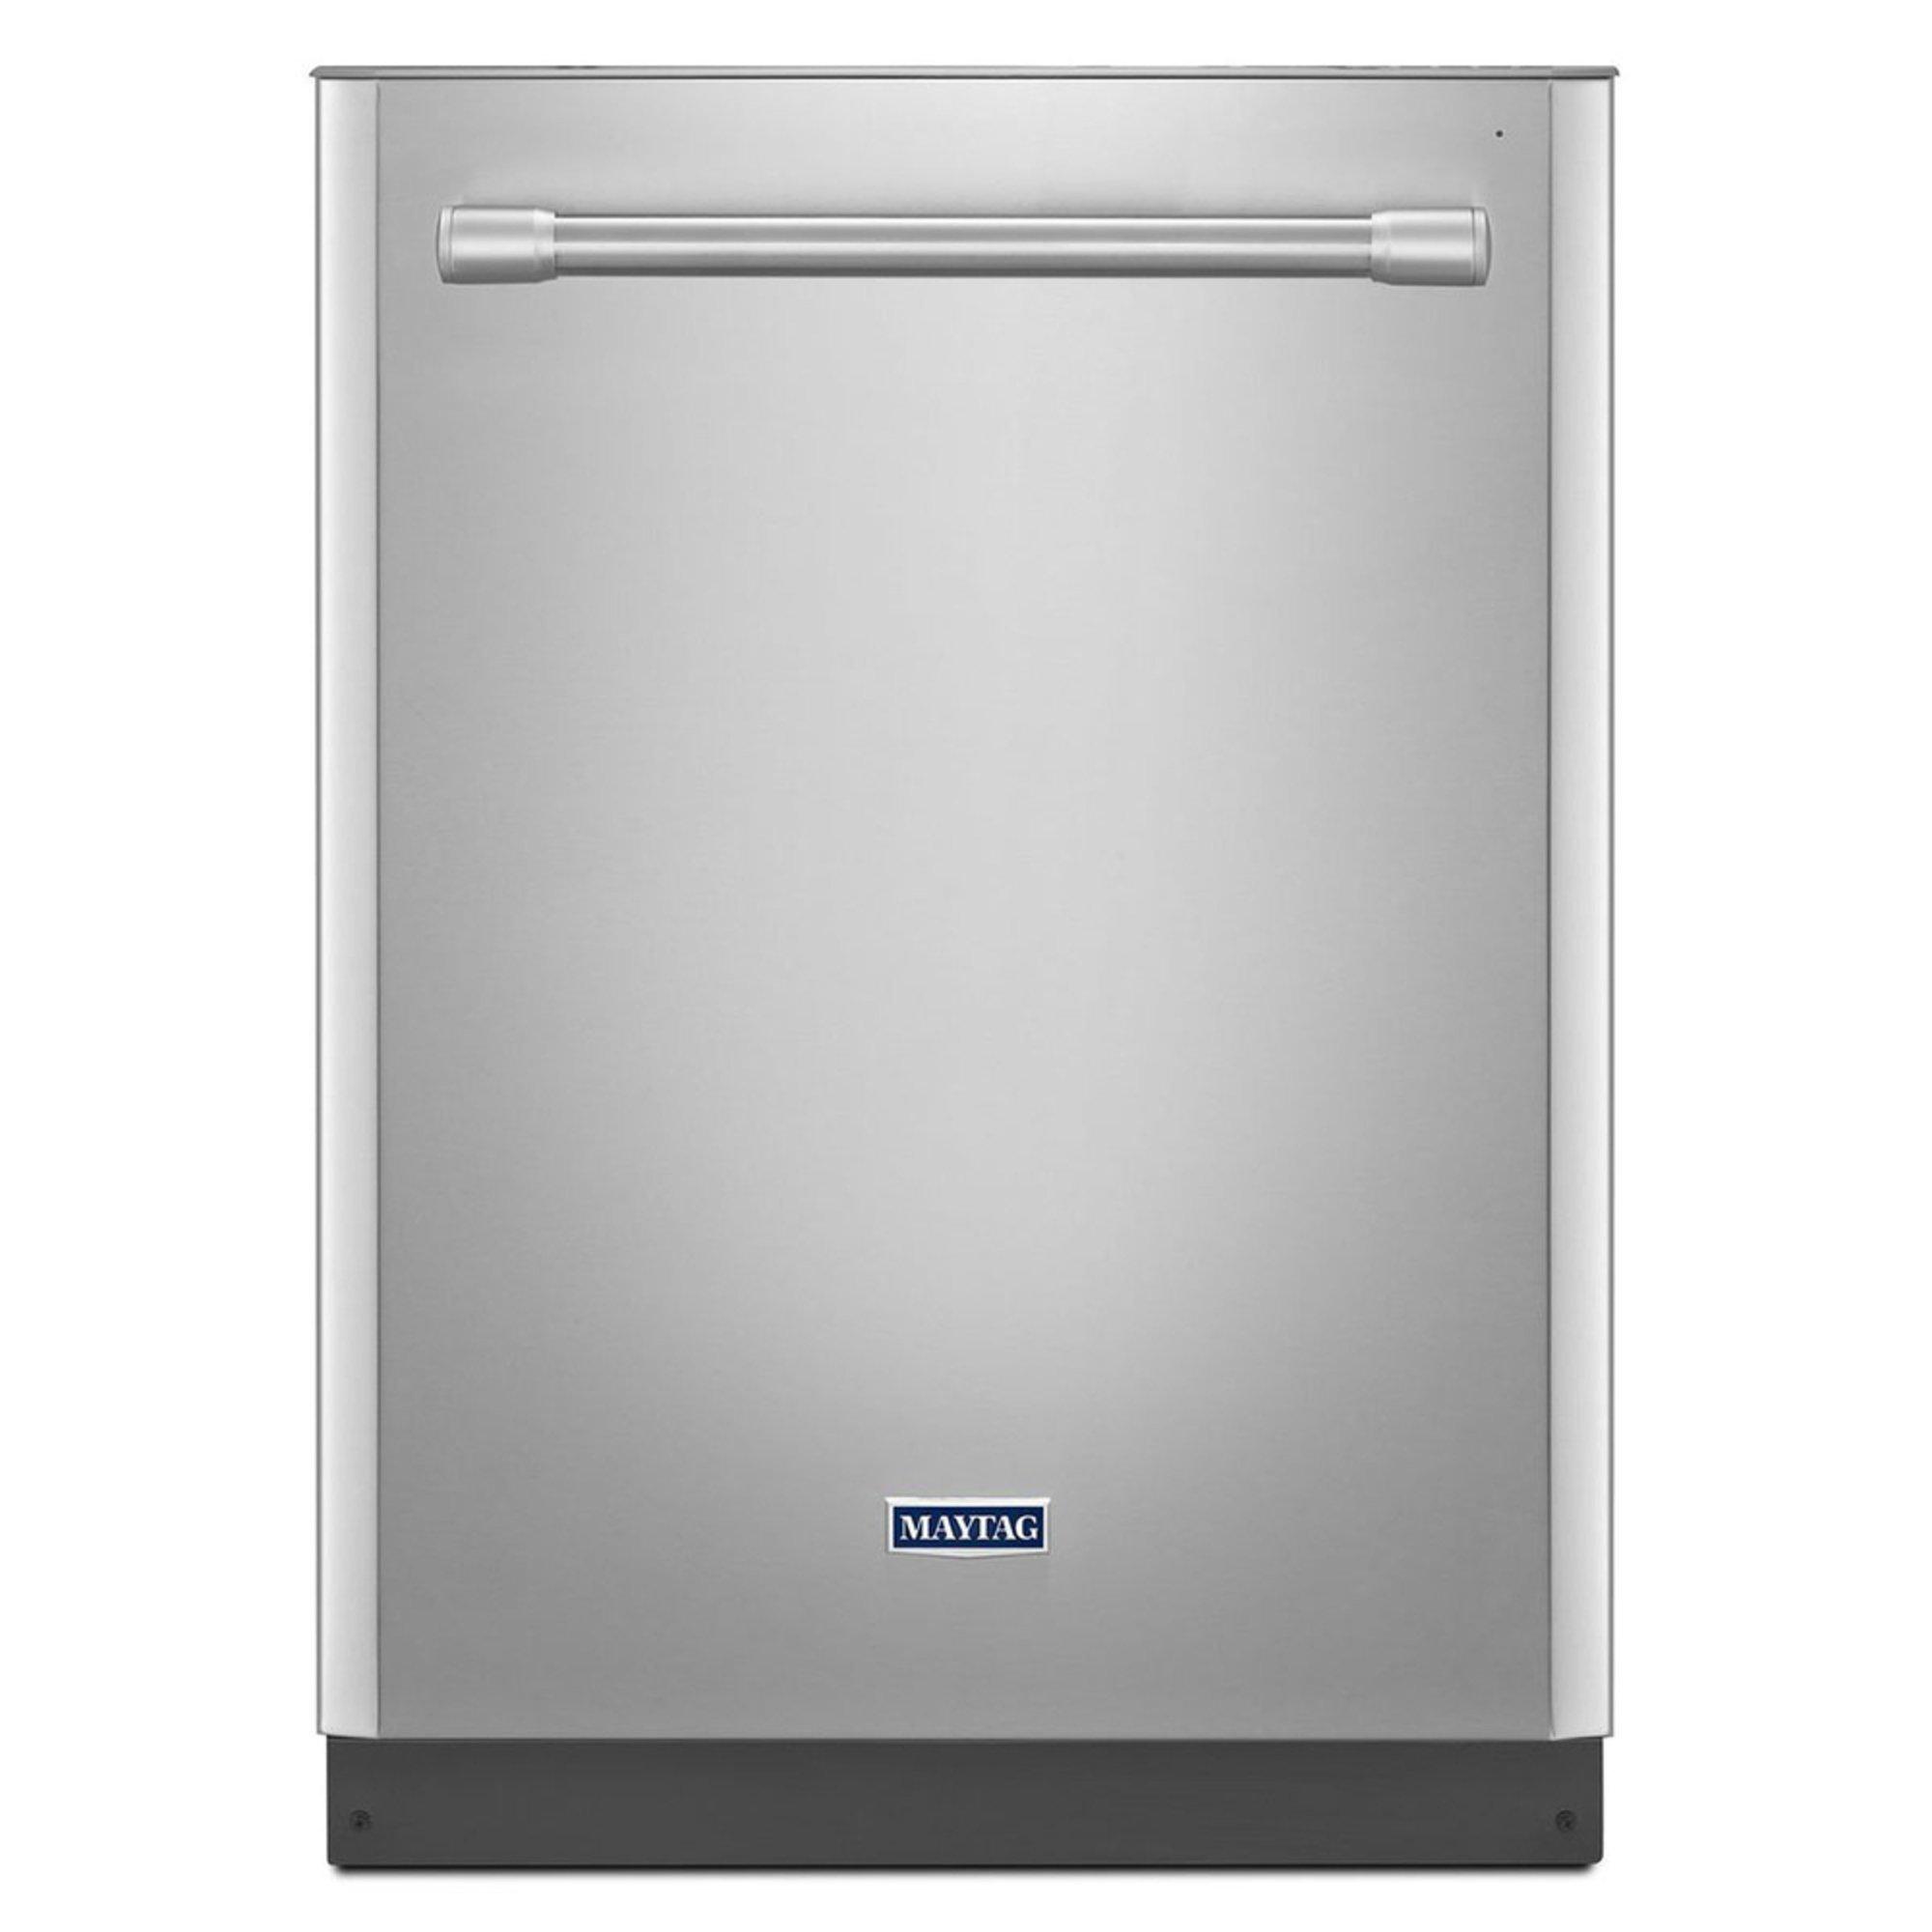 28 maytag dishwasher no power maytag 24 quot built in dishw